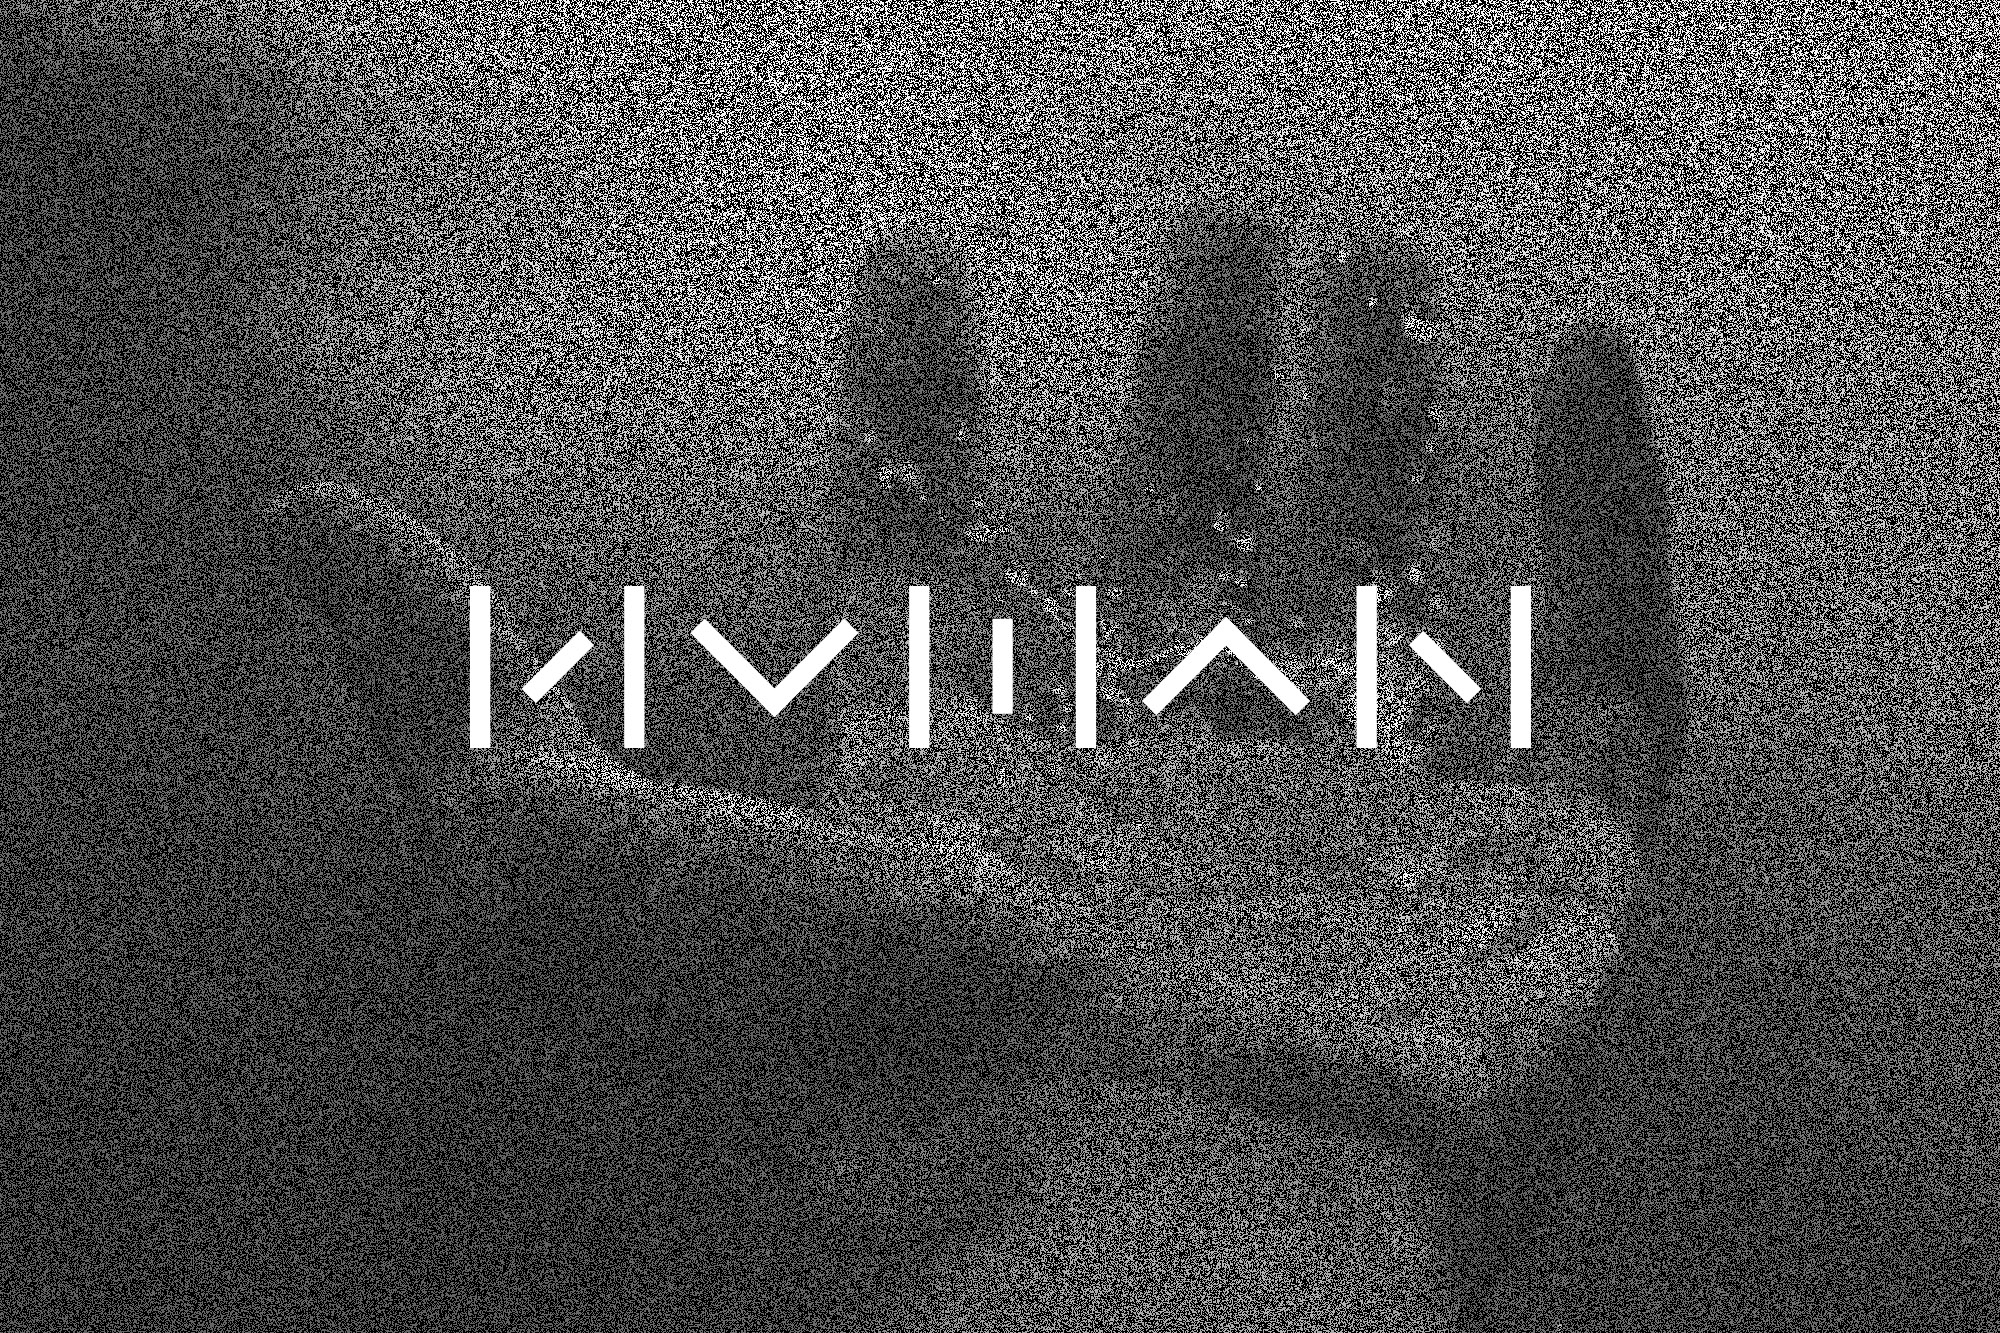 HUMAN - logo, brand, design - guillermotorres | ello